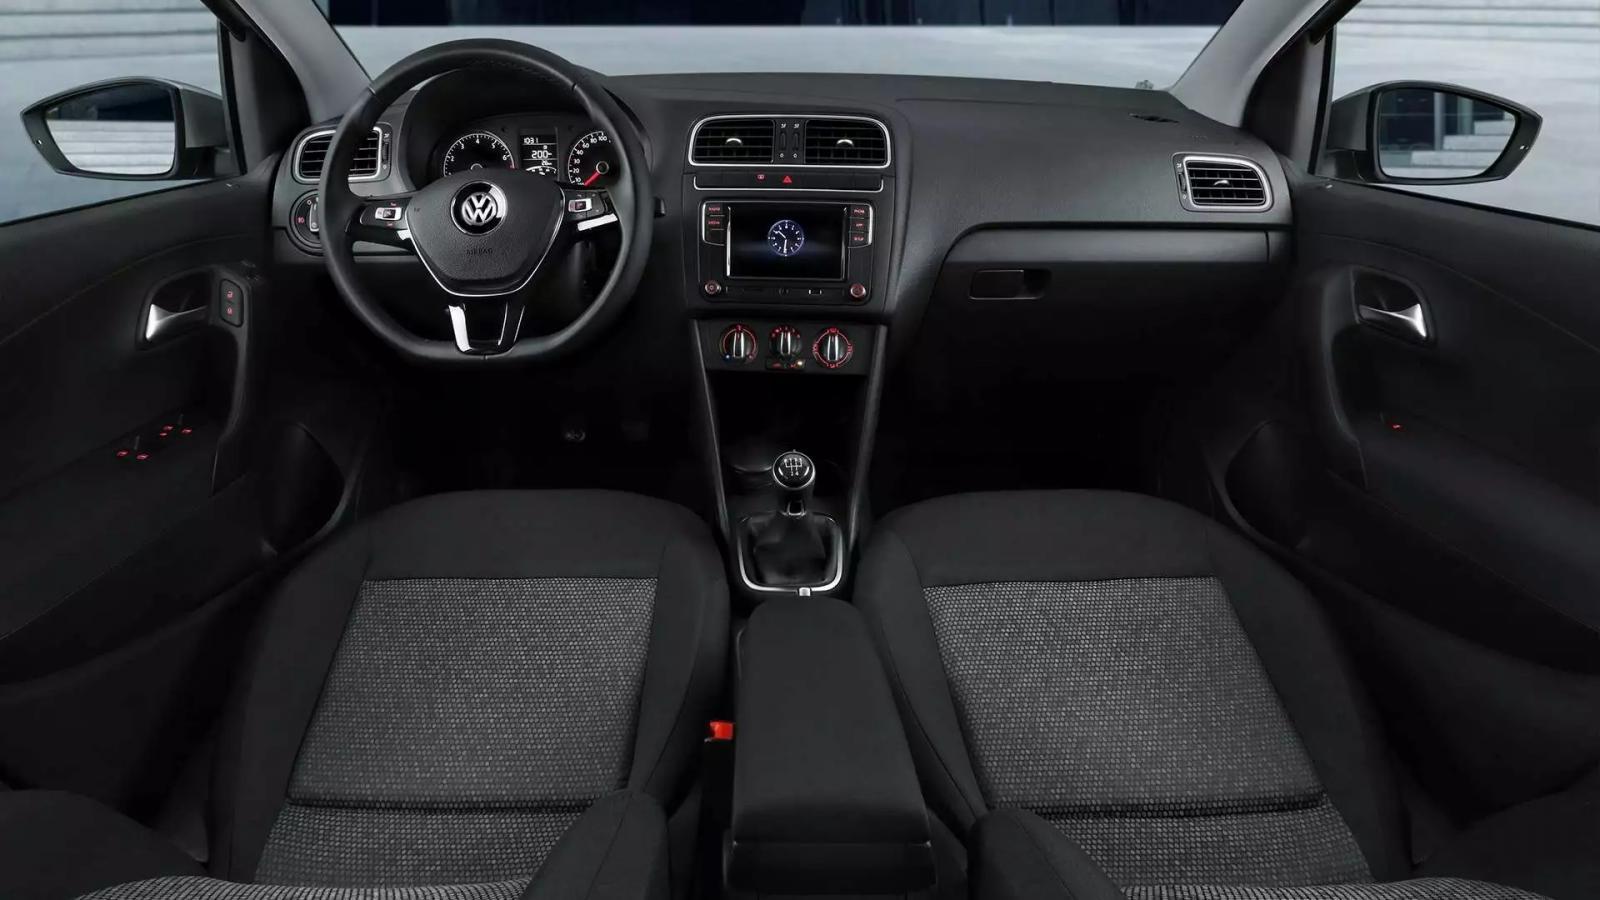 Volkswagen Polo 2020 precio en México